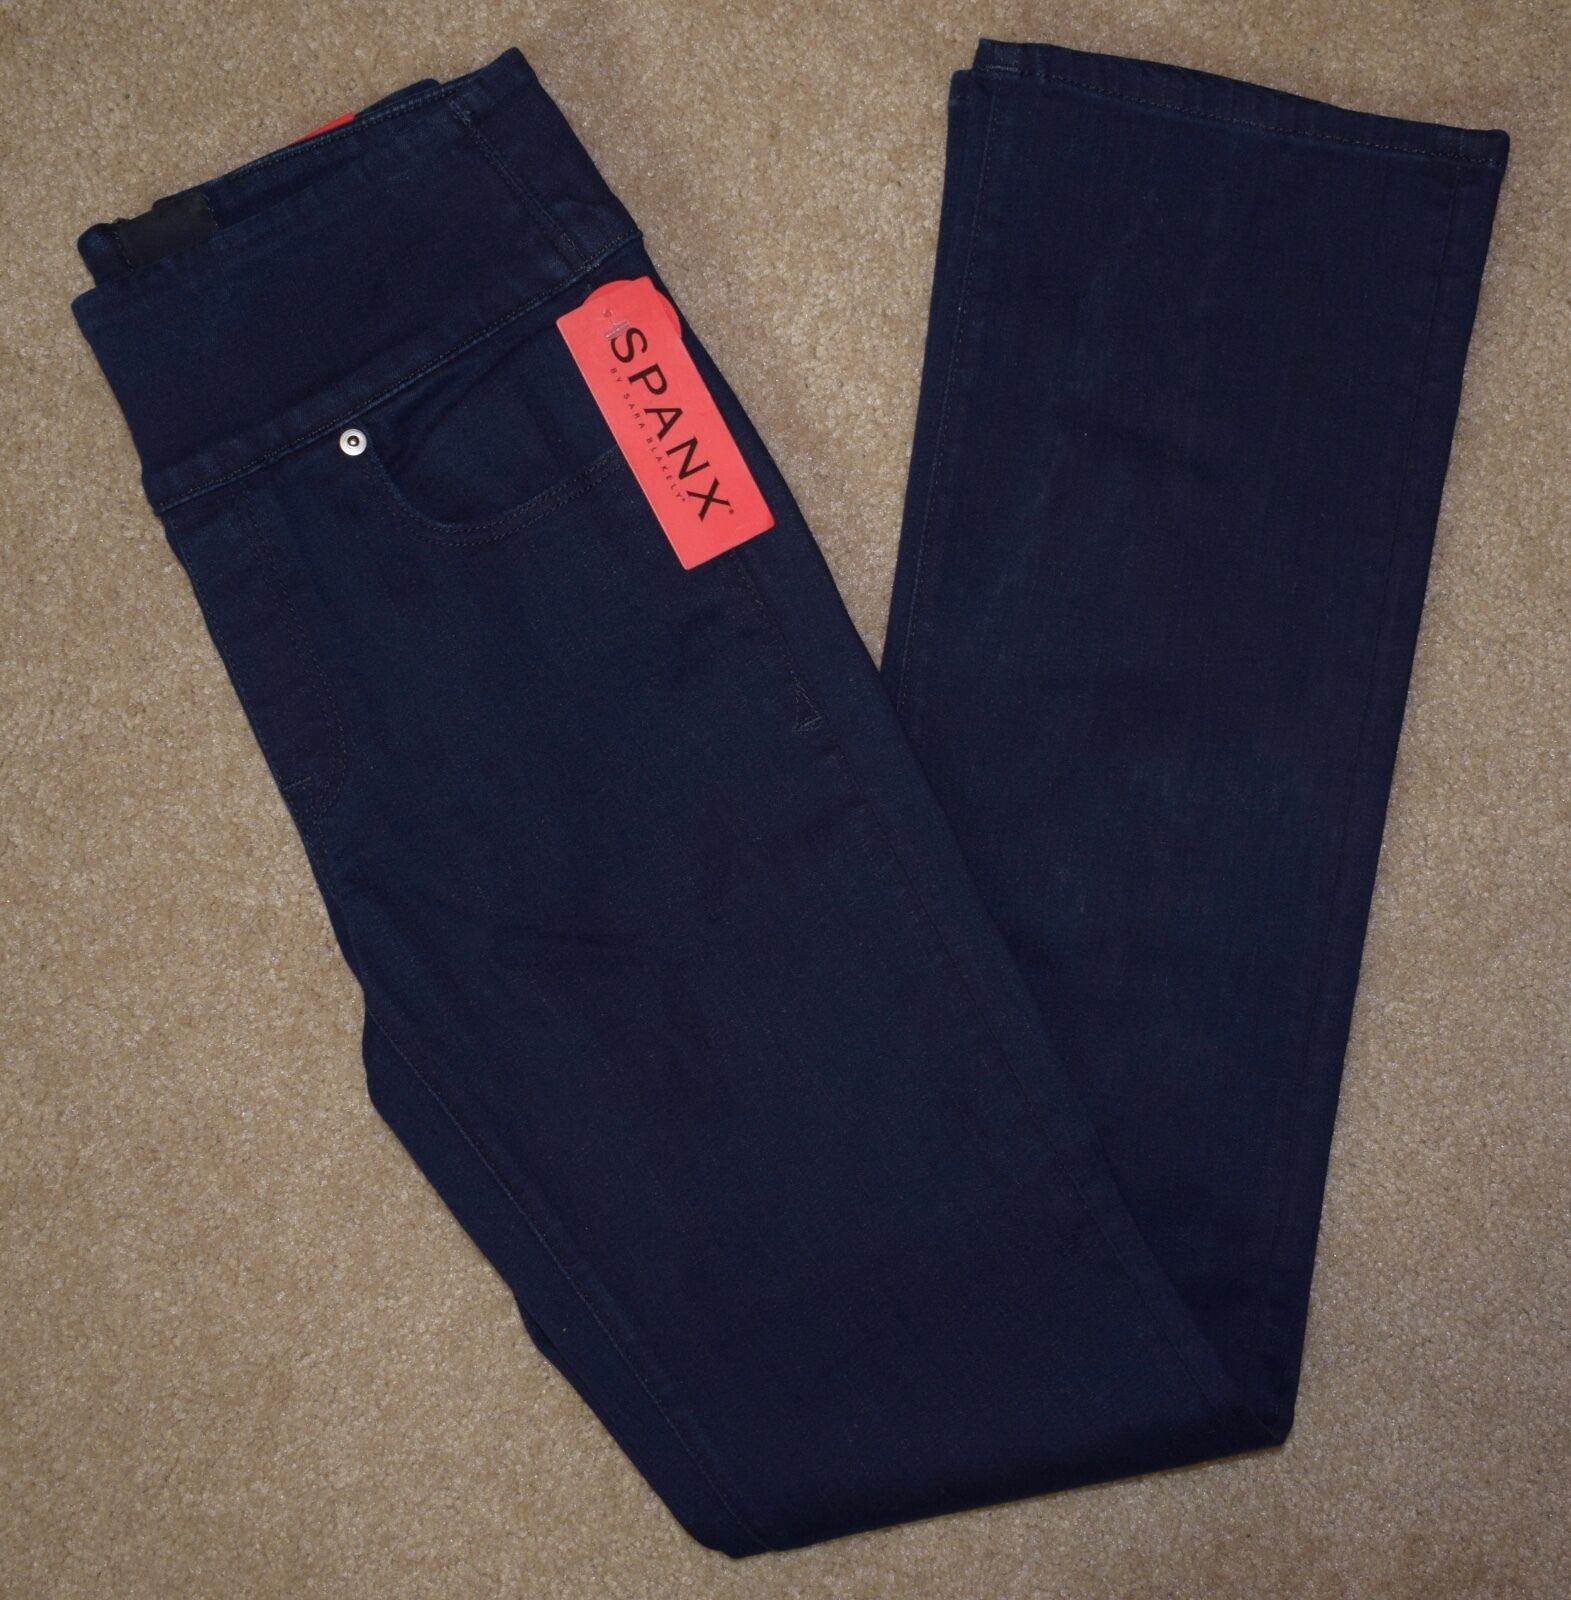 New Spanx Jeans 26 Signature Waist Slim Boot Cut Dark bluee Cotton Stretch